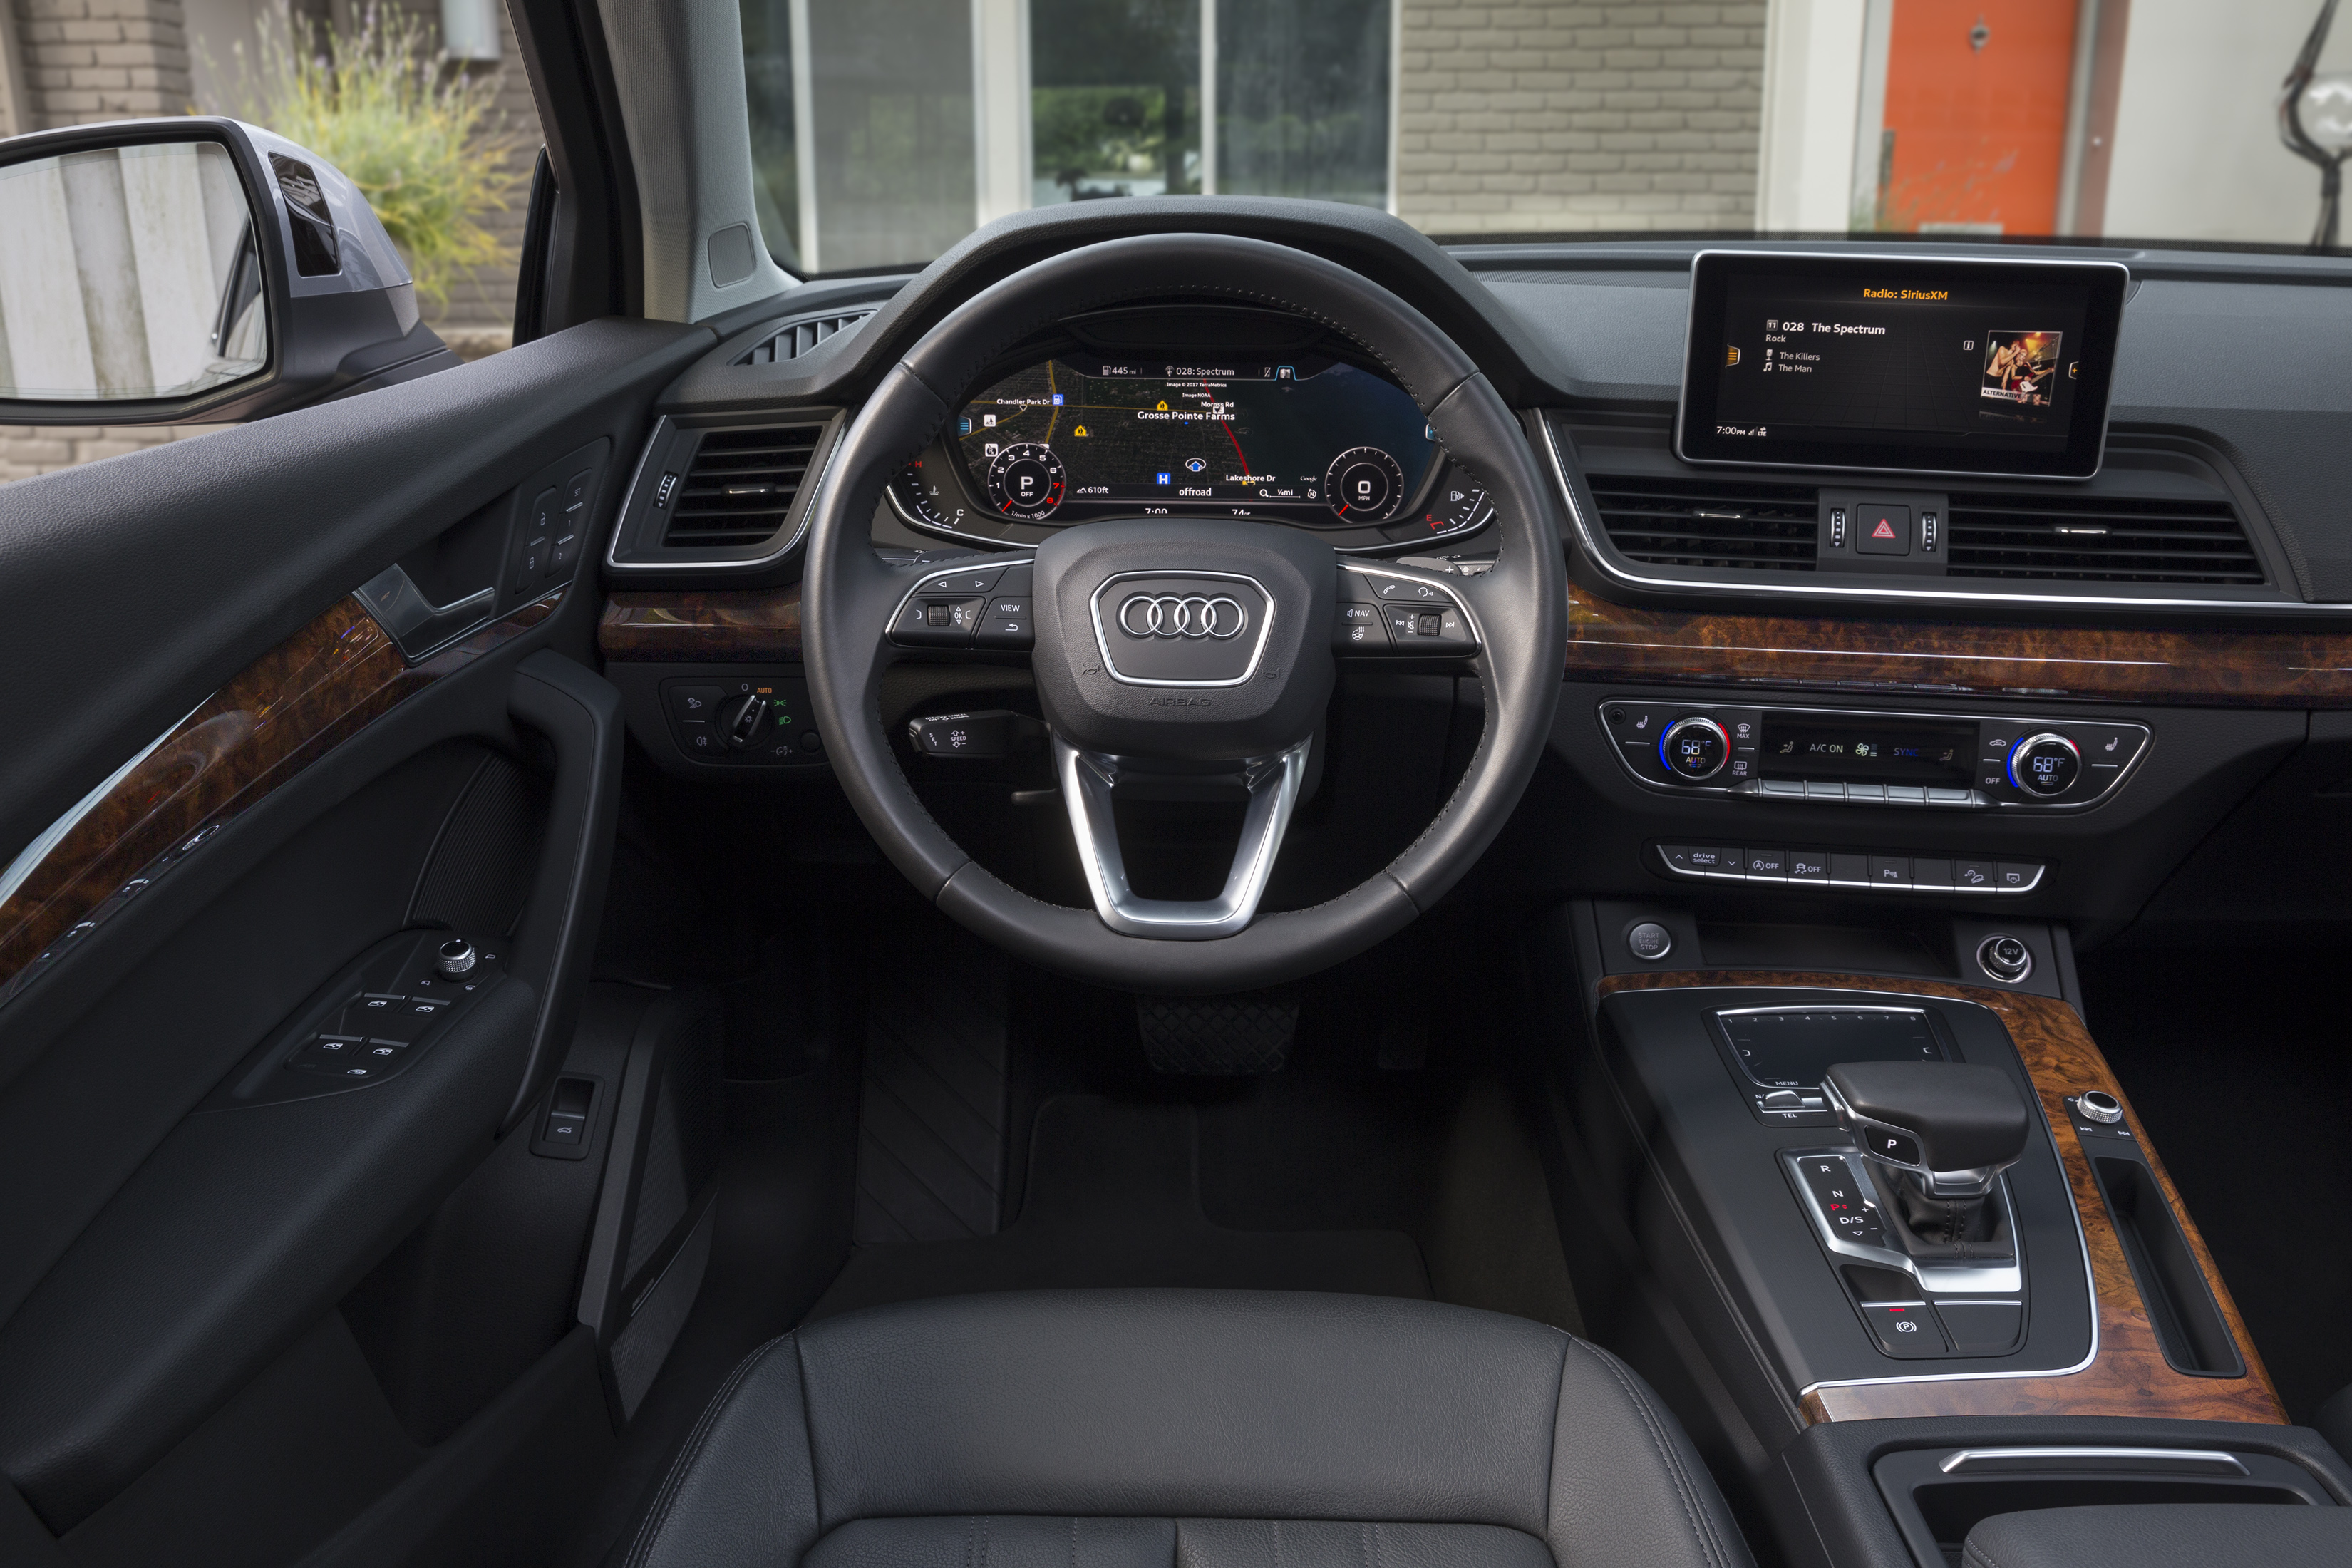 2018 audi q5 named one of autotrader 39 s 10 best car interiors. Black Bedroom Furniture Sets. Home Design Ideas